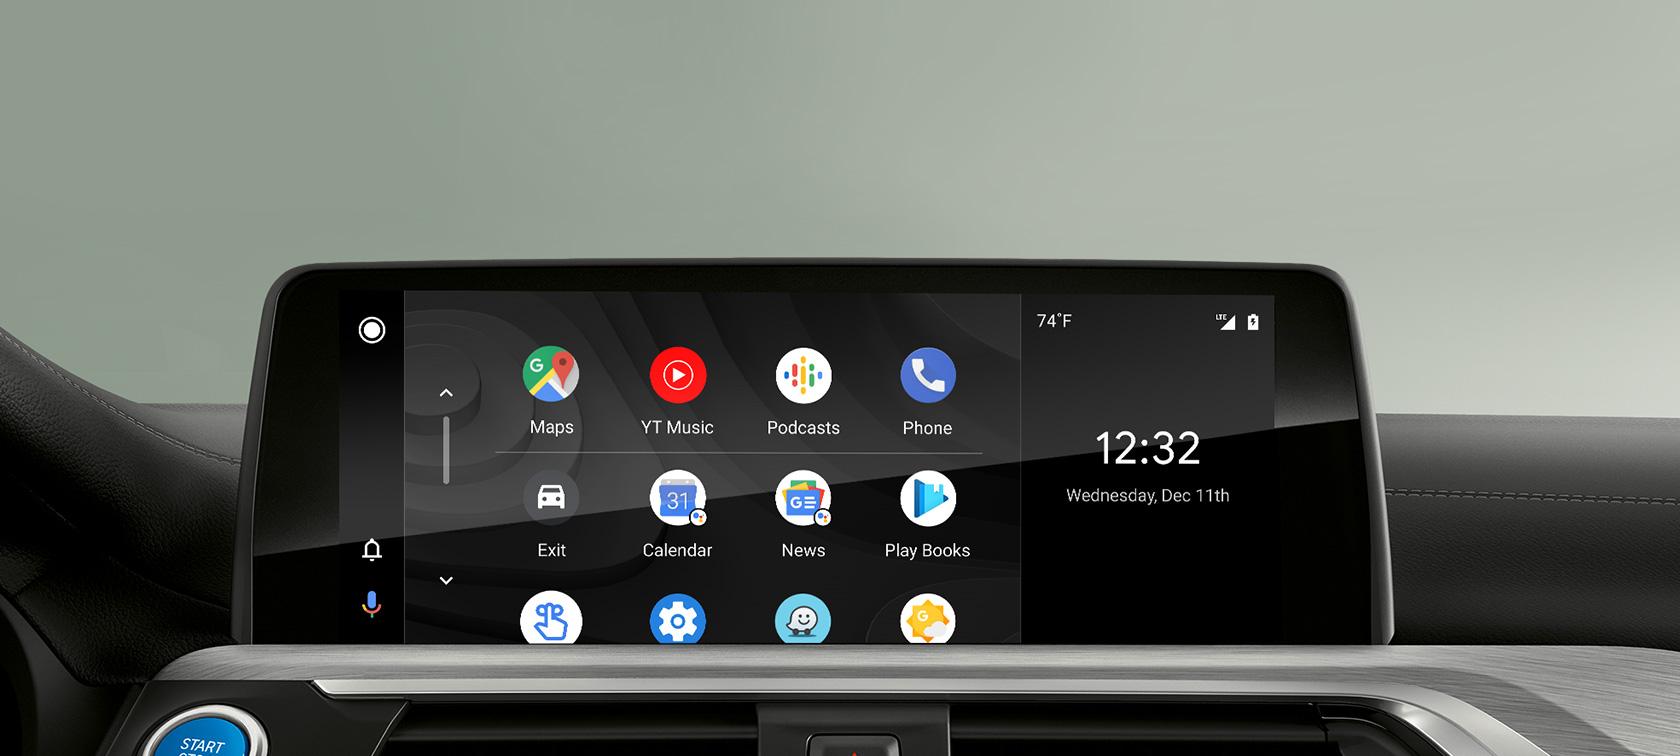 [Image: bmw-cnd-android-auto-sp-desktop.jpg]